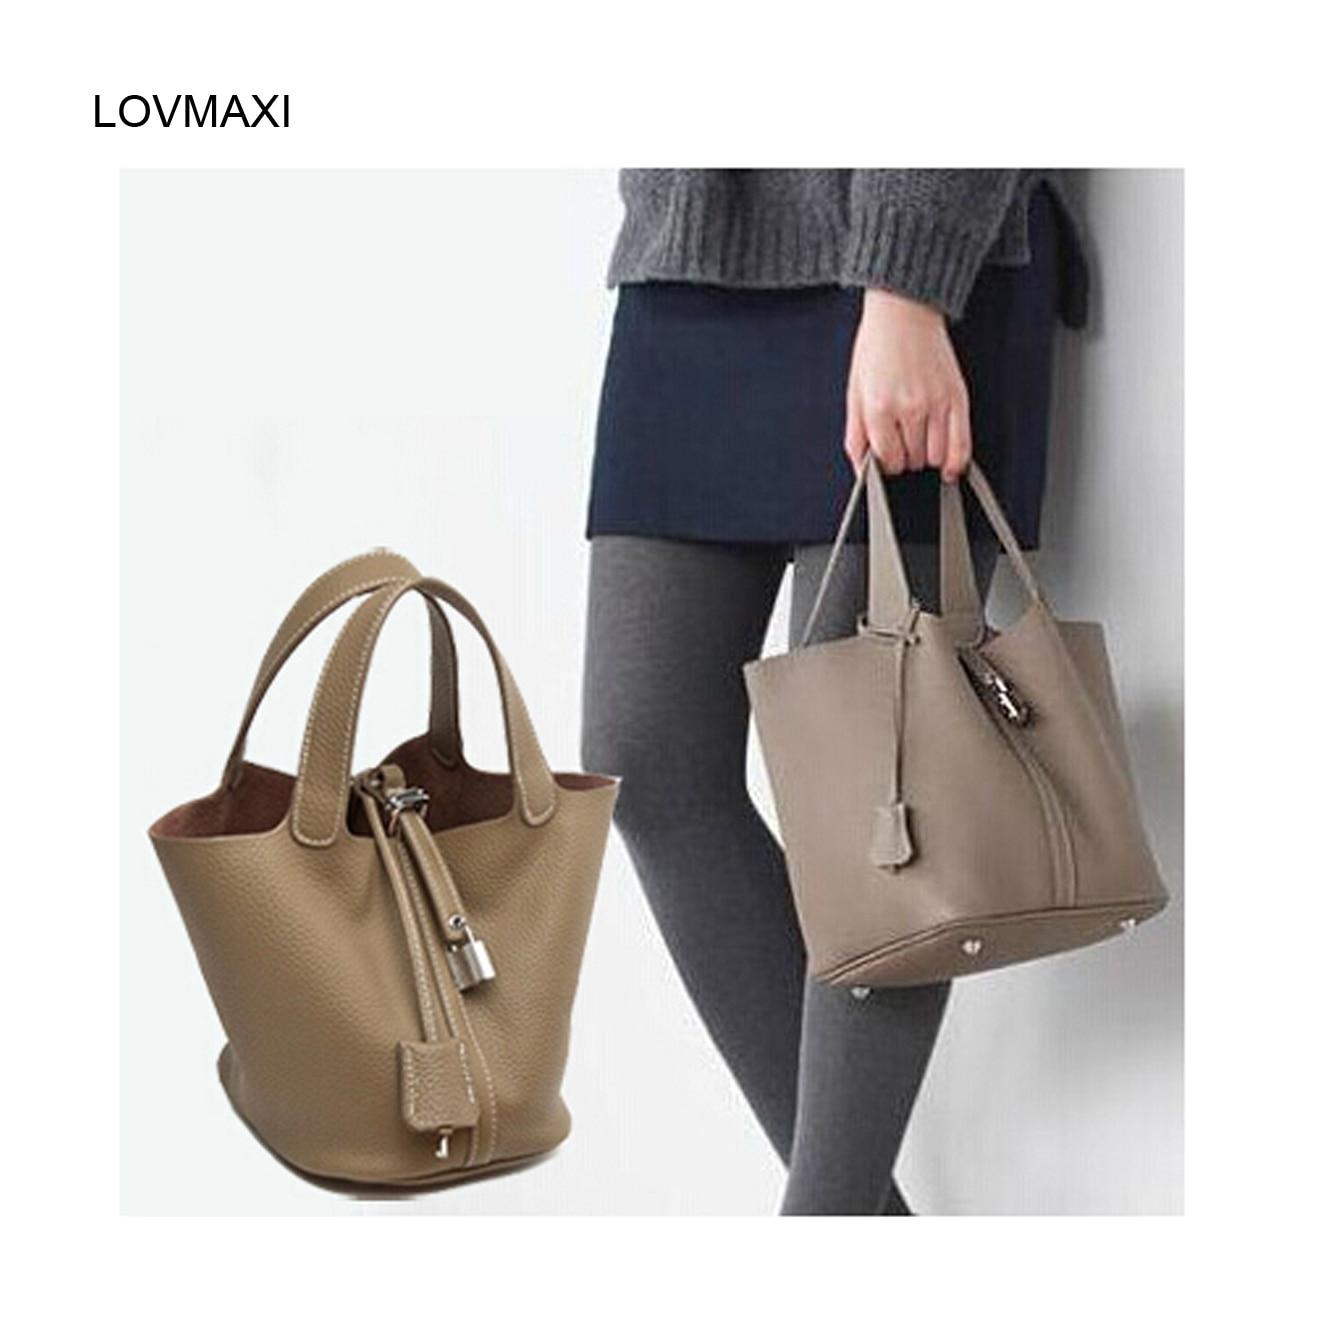 ФОТО Women's bag bucket bag Genuine leather TOTE guaranteed 100% genuine leather bucket bags Brand Designer shoulder handbags